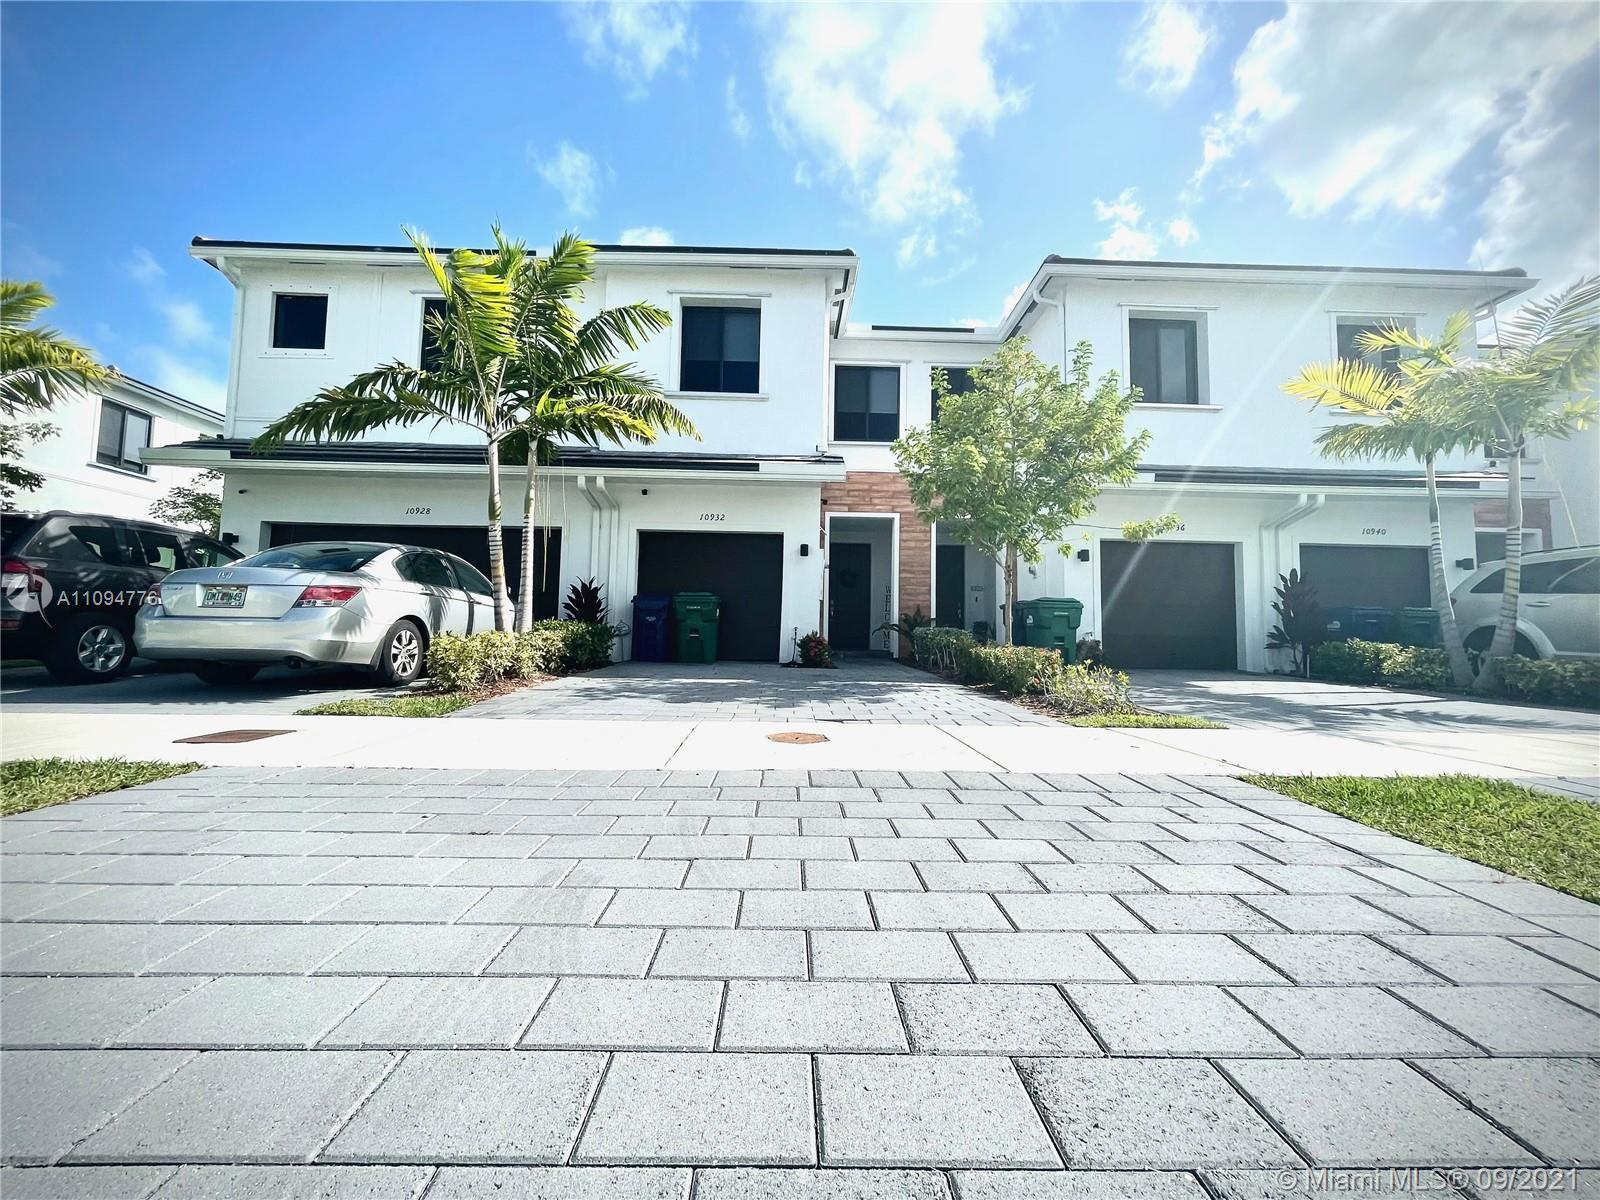 10932 Sw 235th Ln 1 Property Photo 1